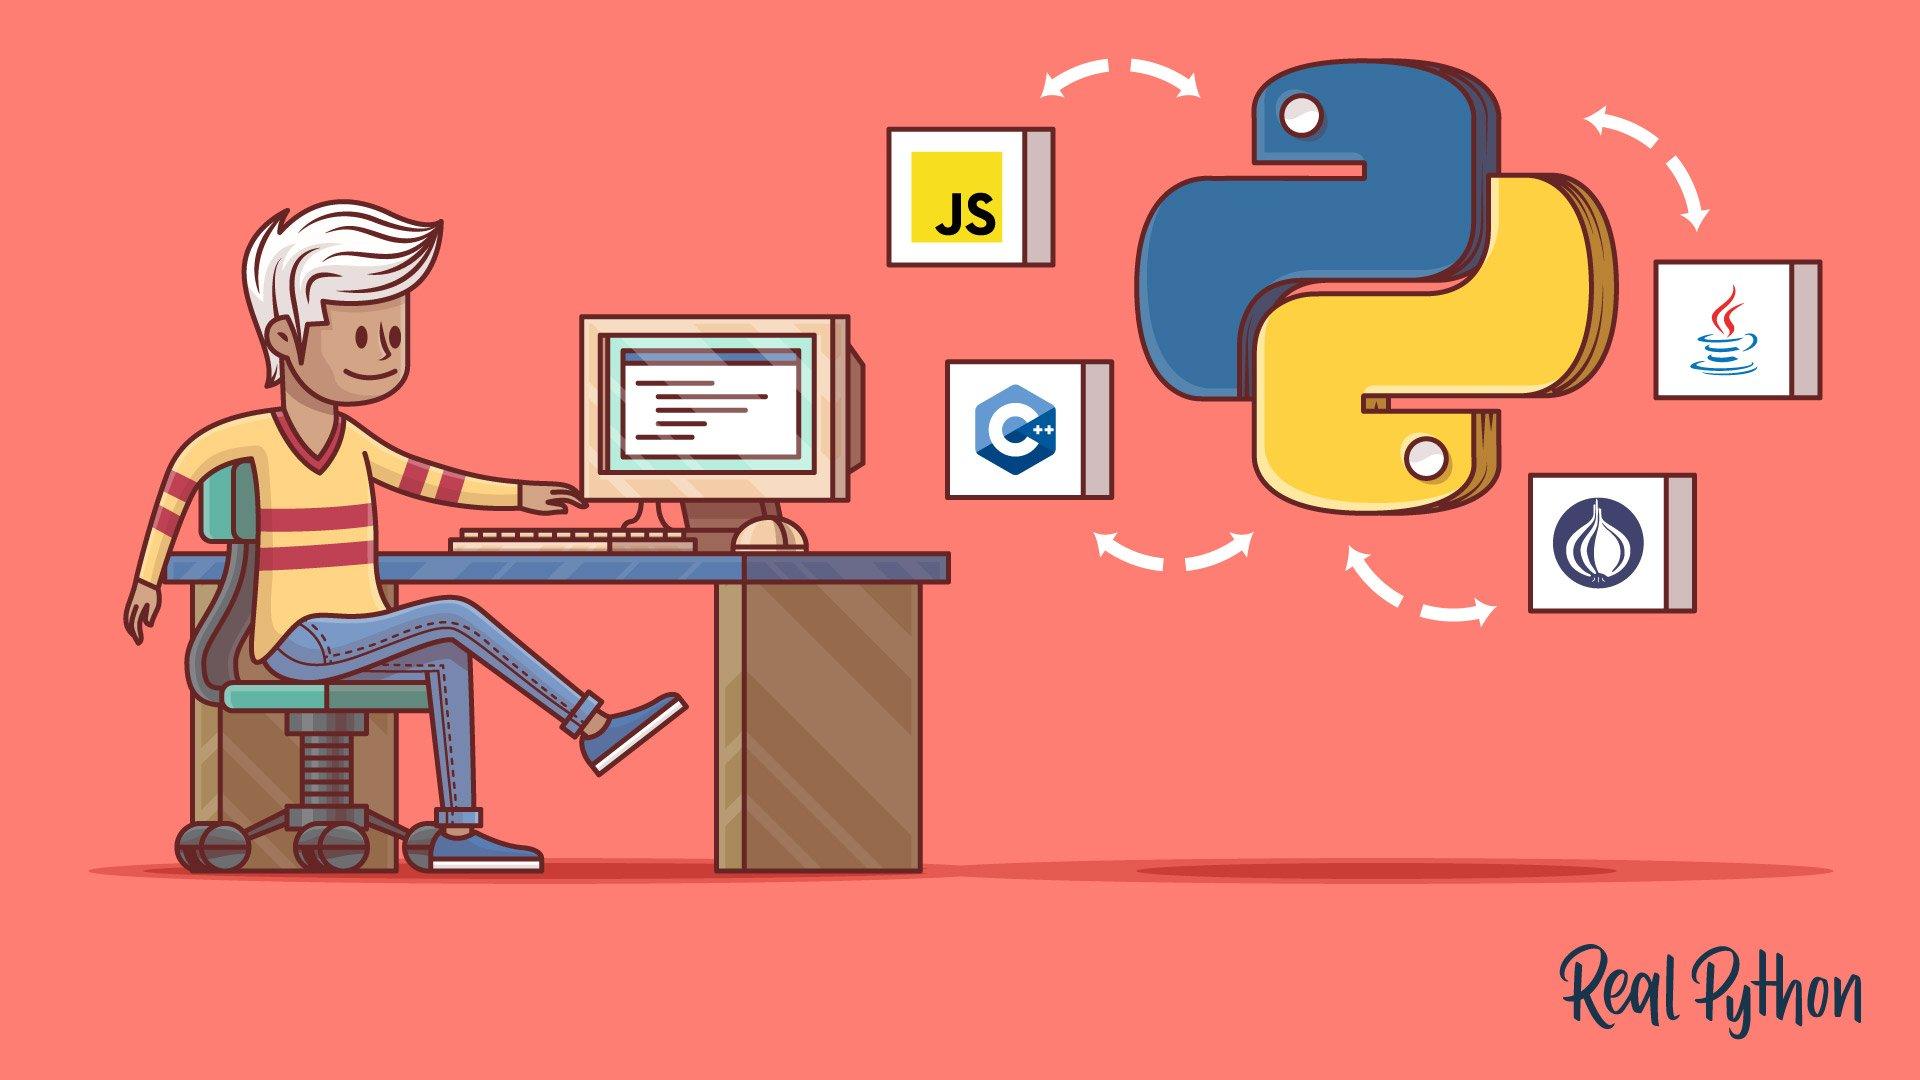 Switching to Python